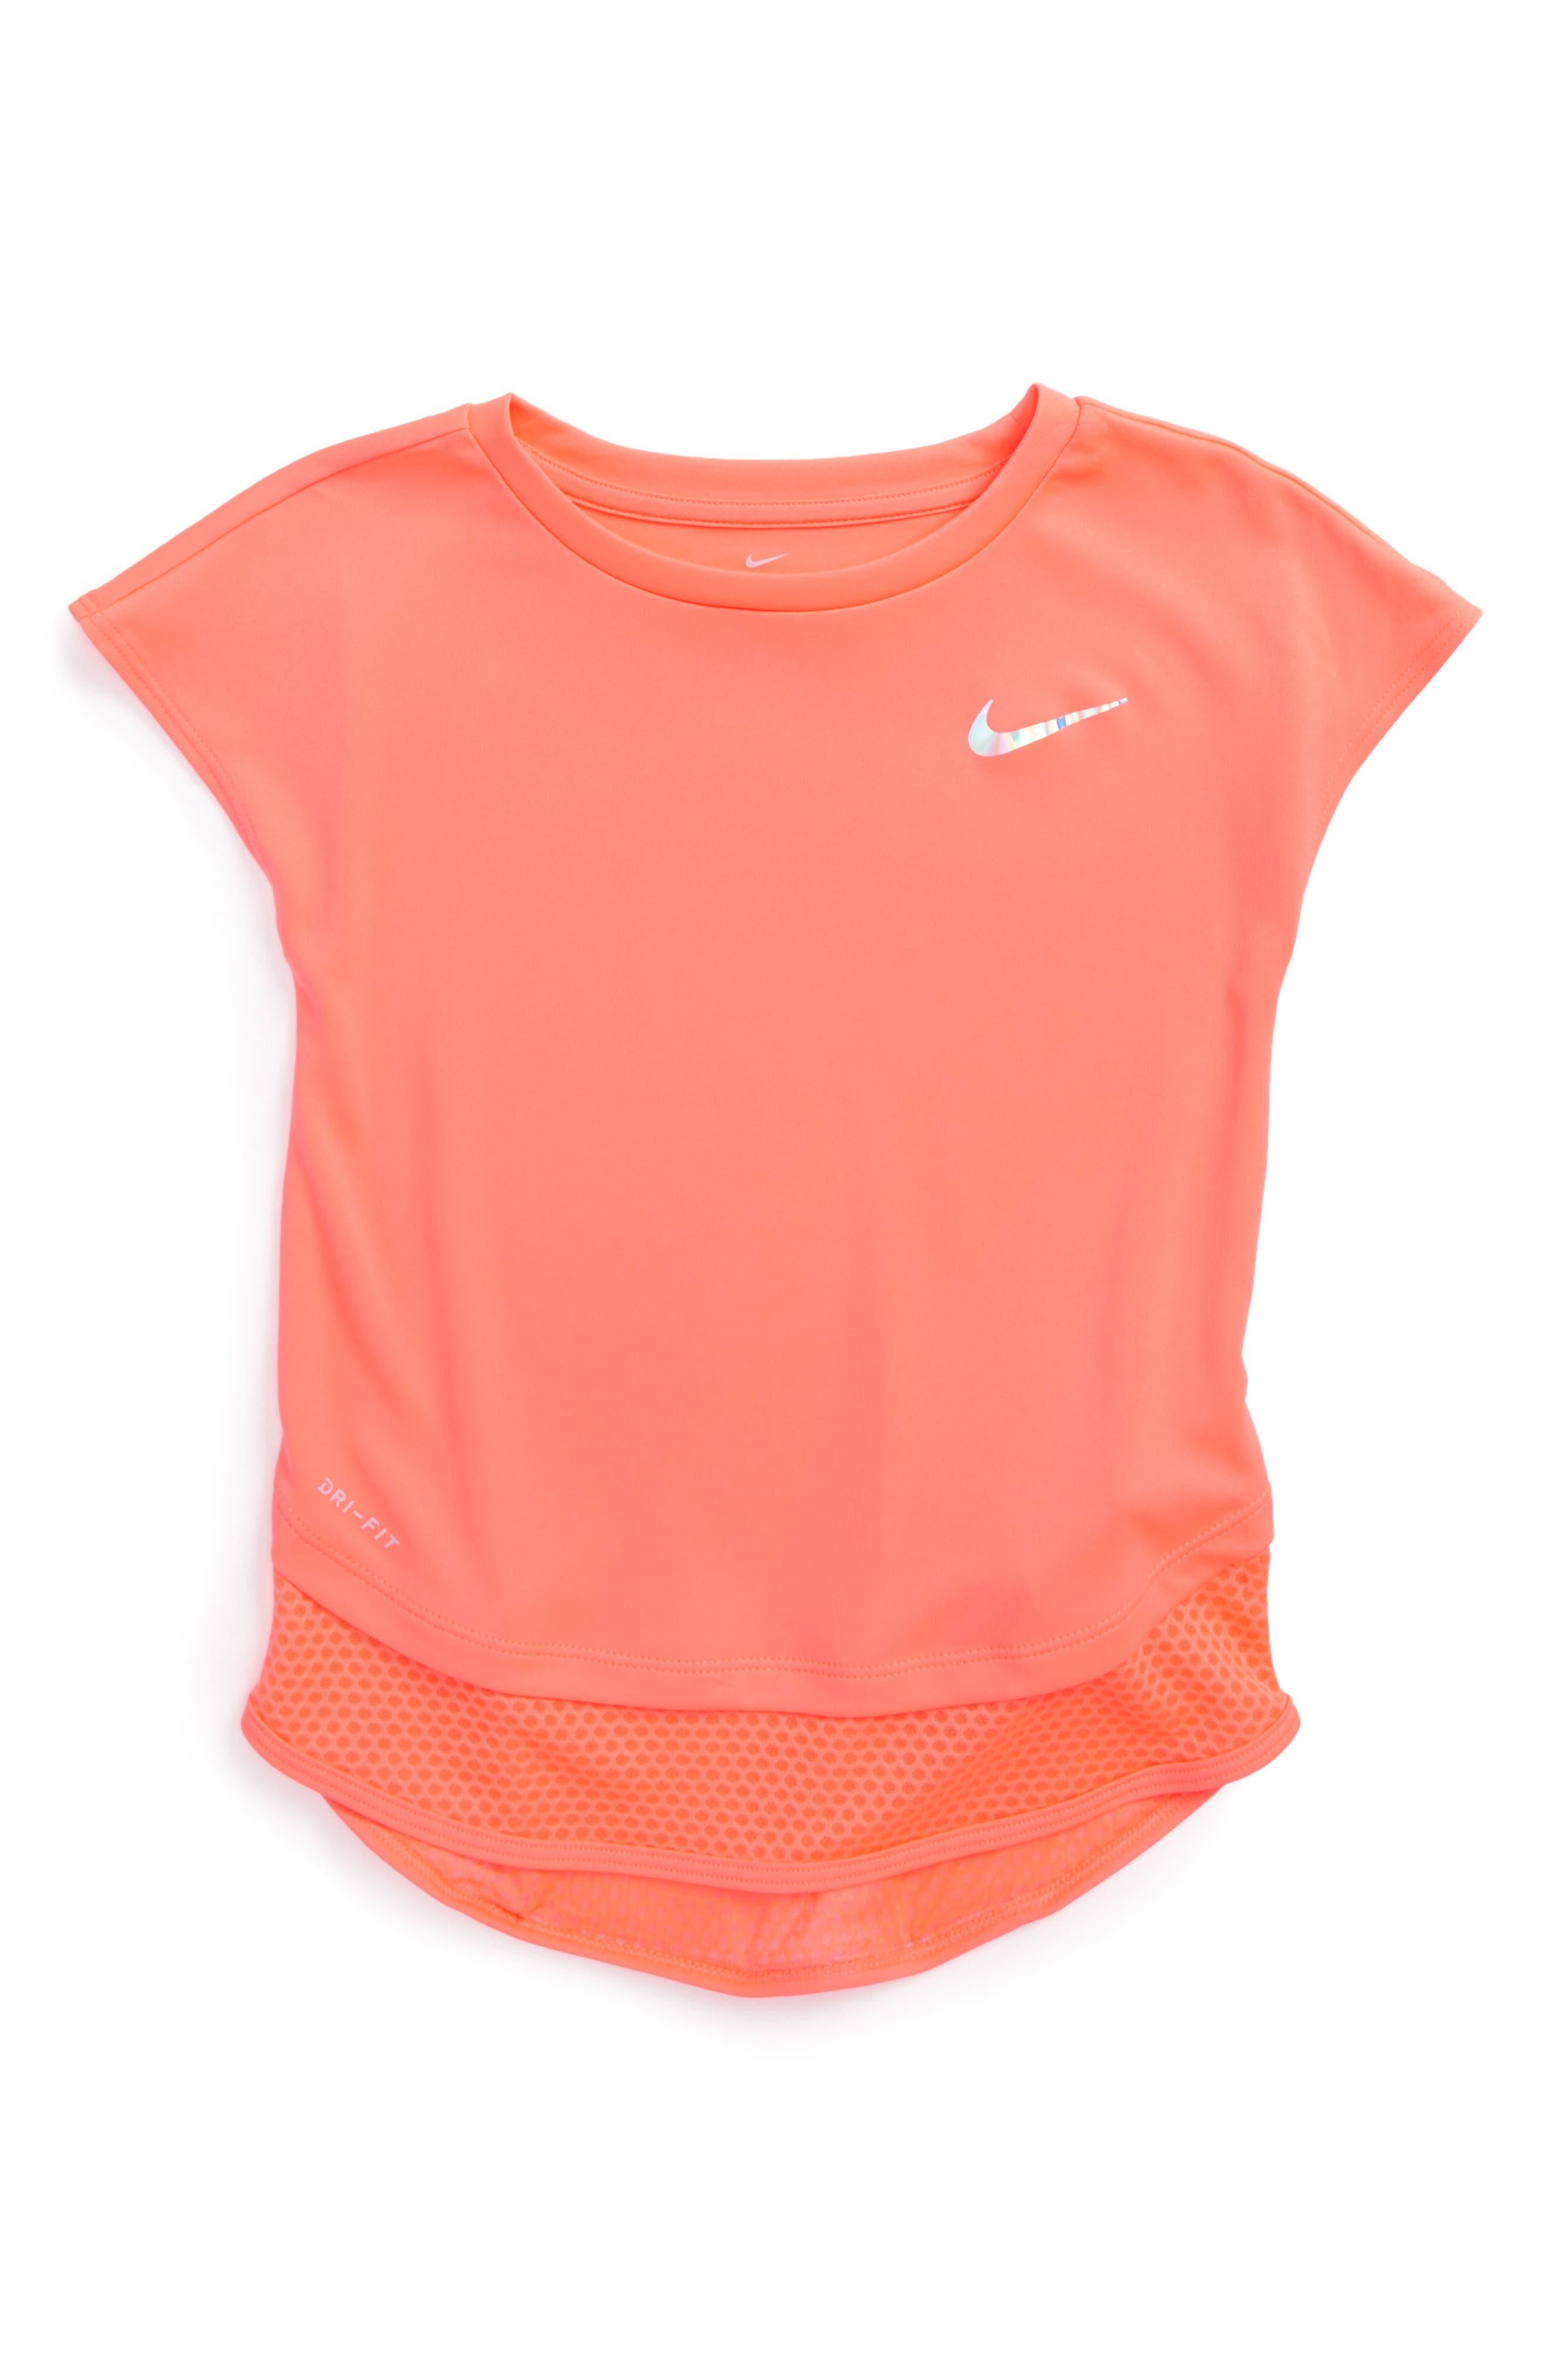 Main Image - Nike Dry Modern Tunic (Toddler Girls & Little Girls)